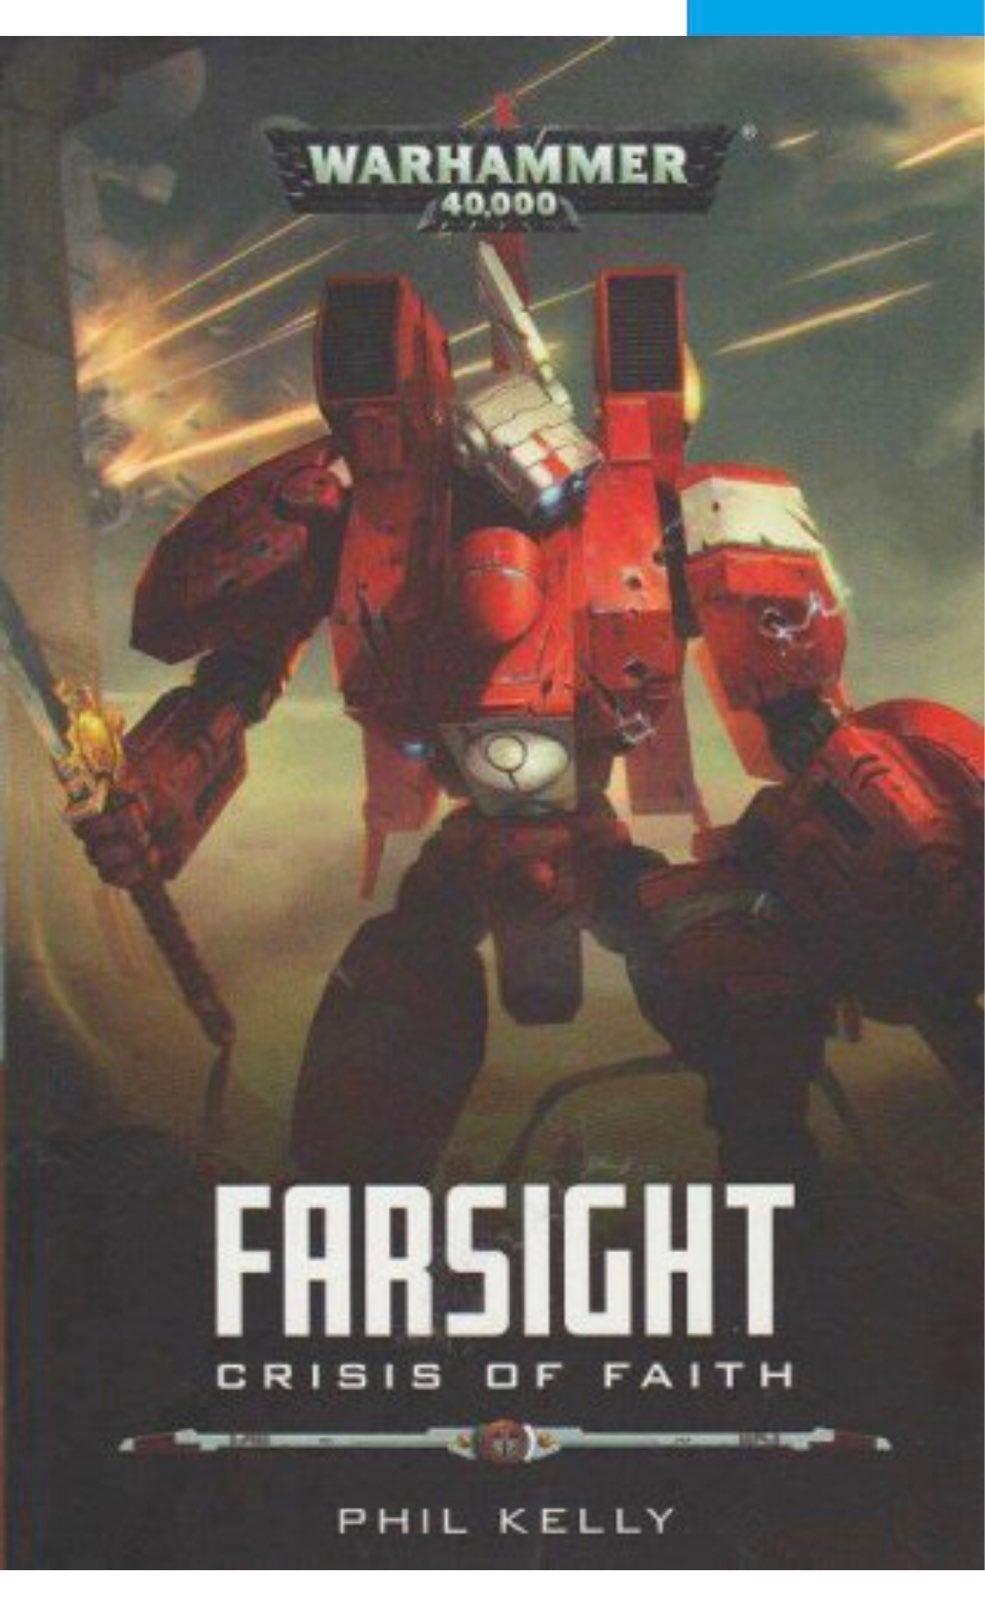 Warhammer - Farsight Crisis of Faith book